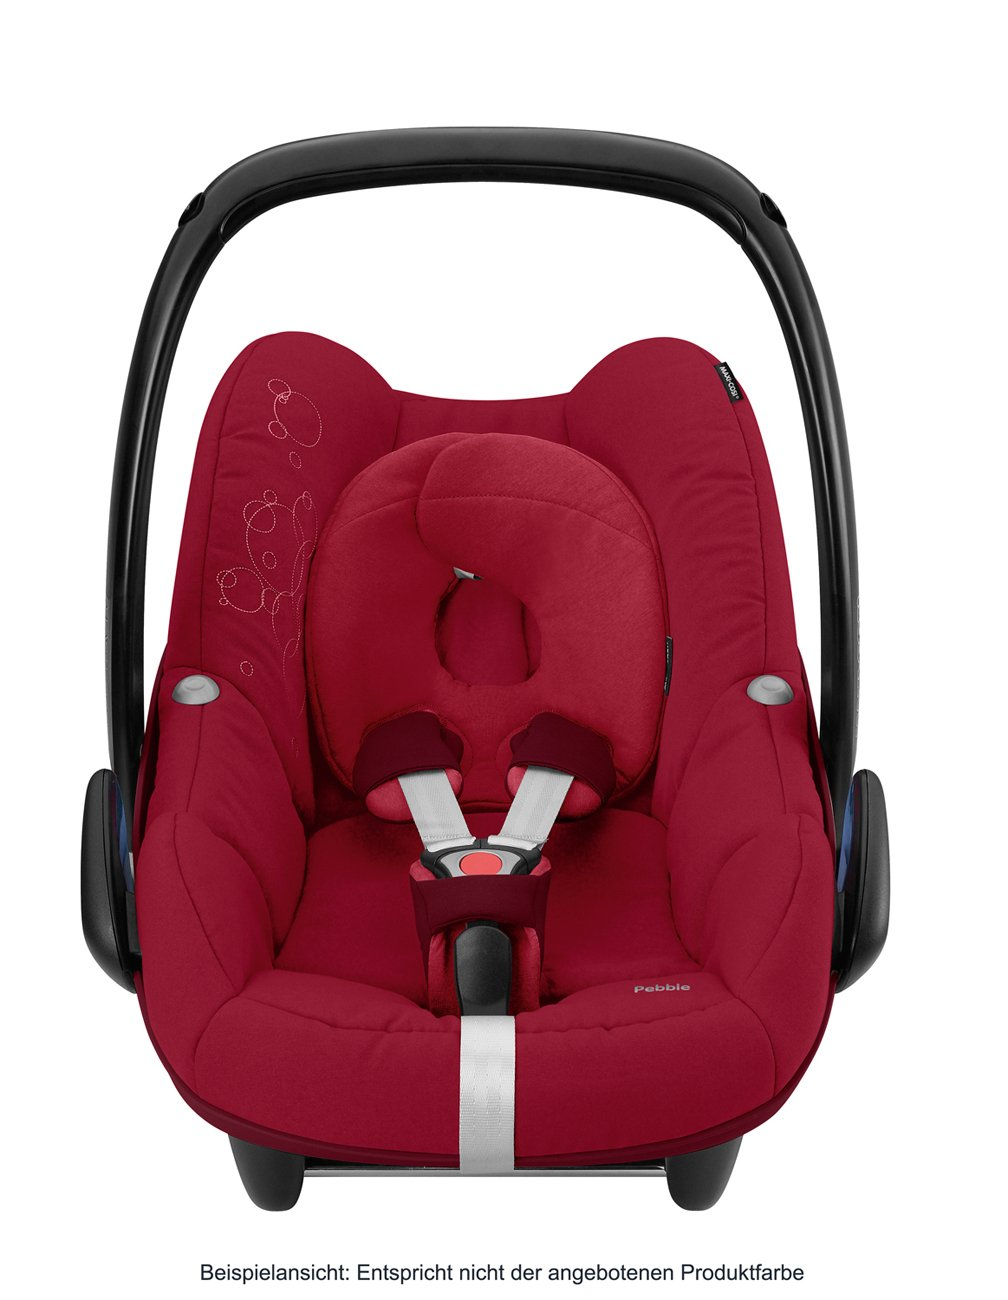 Maxi-Cosi Pebble Child's Car Seat Group 0 0-13 kg Maxi-Cosi  26